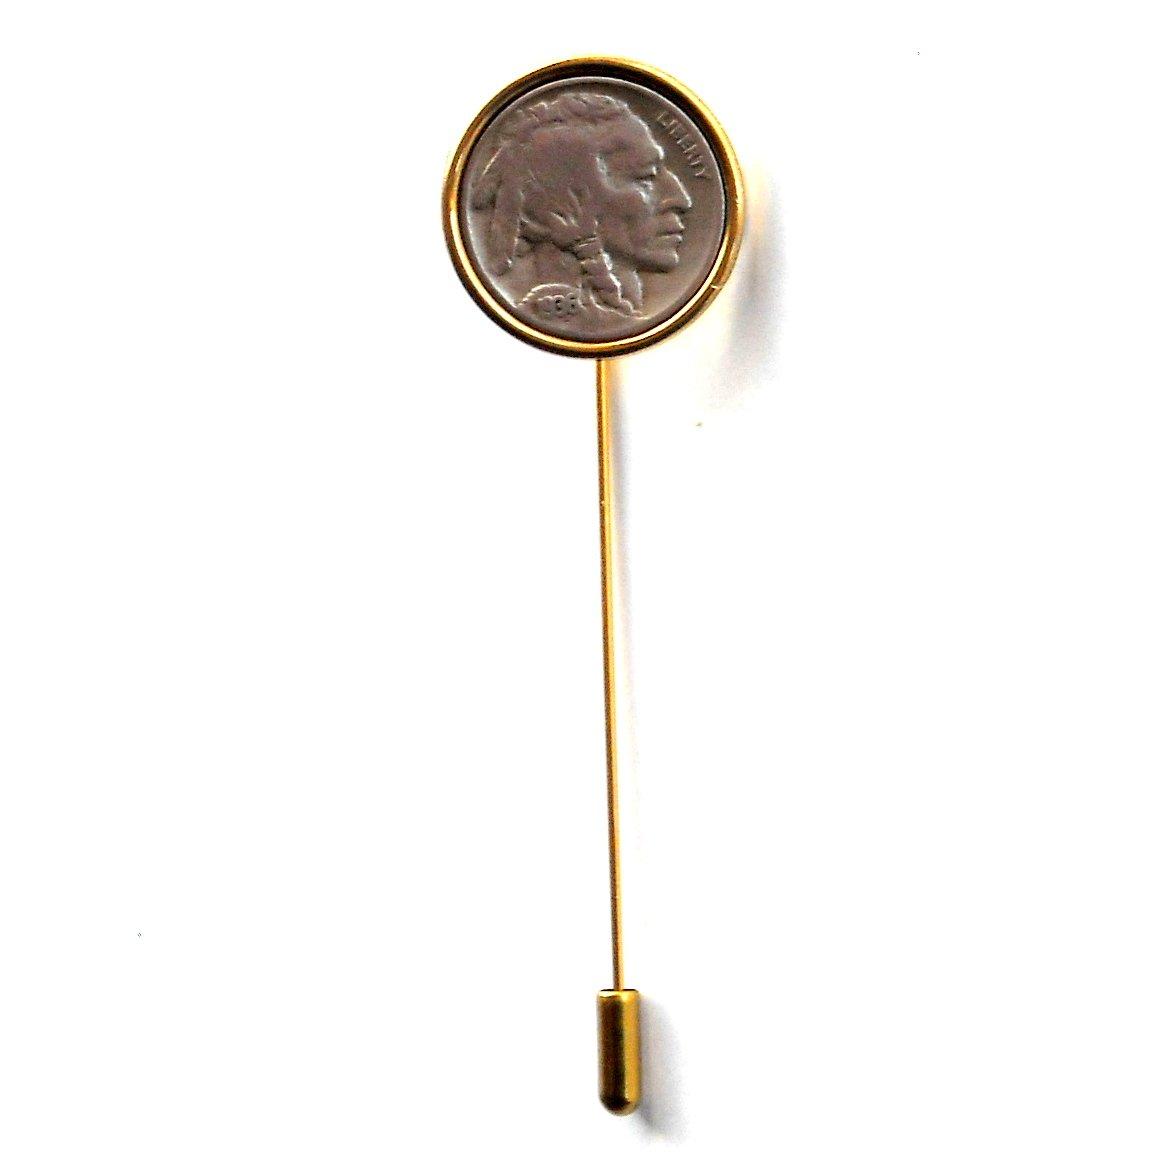 Indian Head Coin Nickel Gold Color Vintage Necktie Stick Clutch Pin